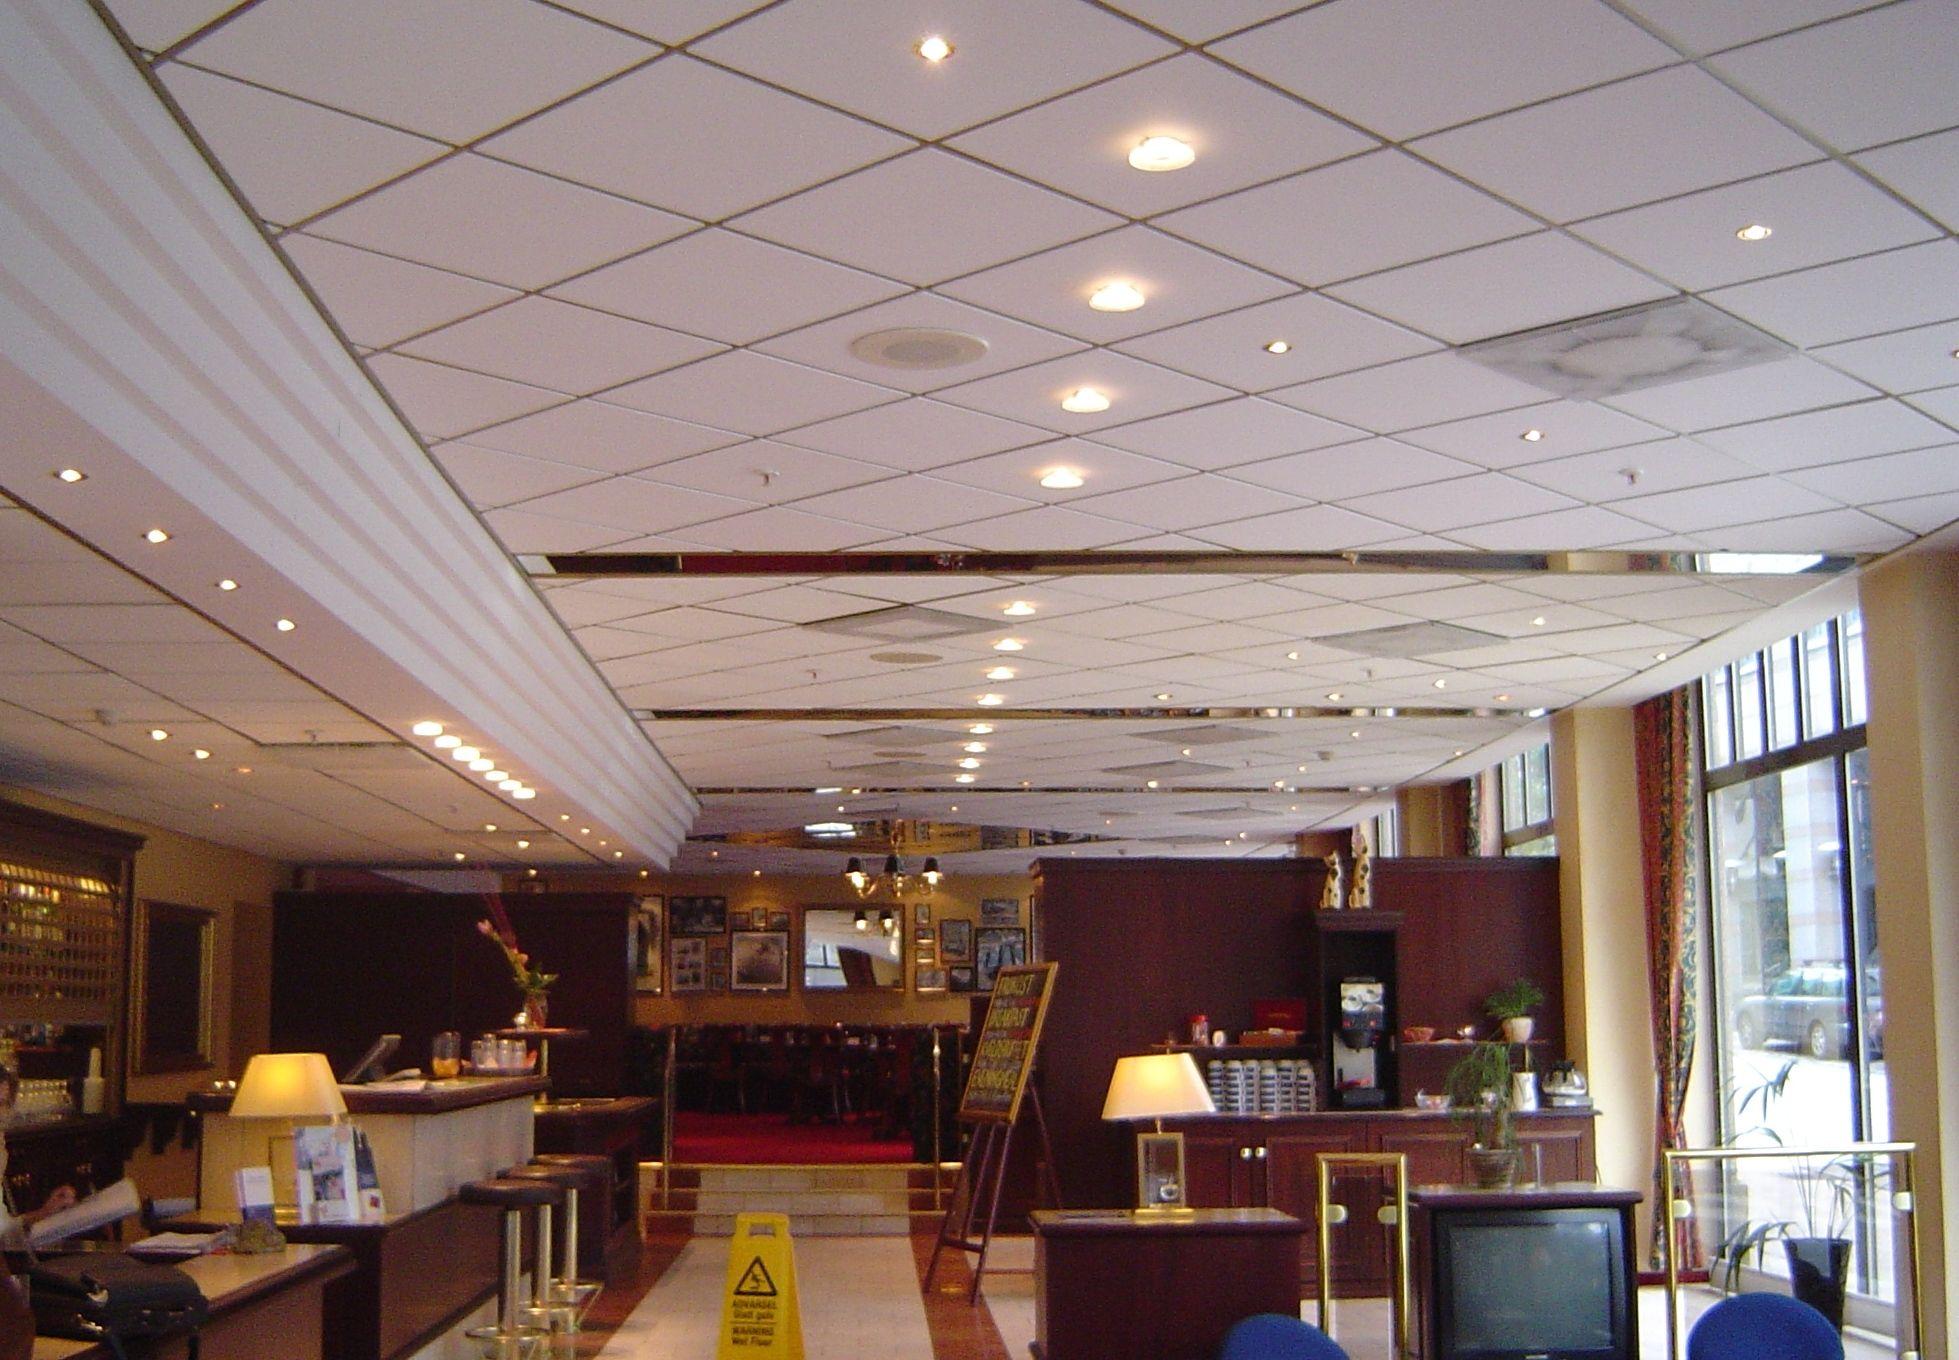 Gypsum ceiling tiles designs httpcreativechairsandtables gypsum ceiling tiles designs dailygadgetfo Images